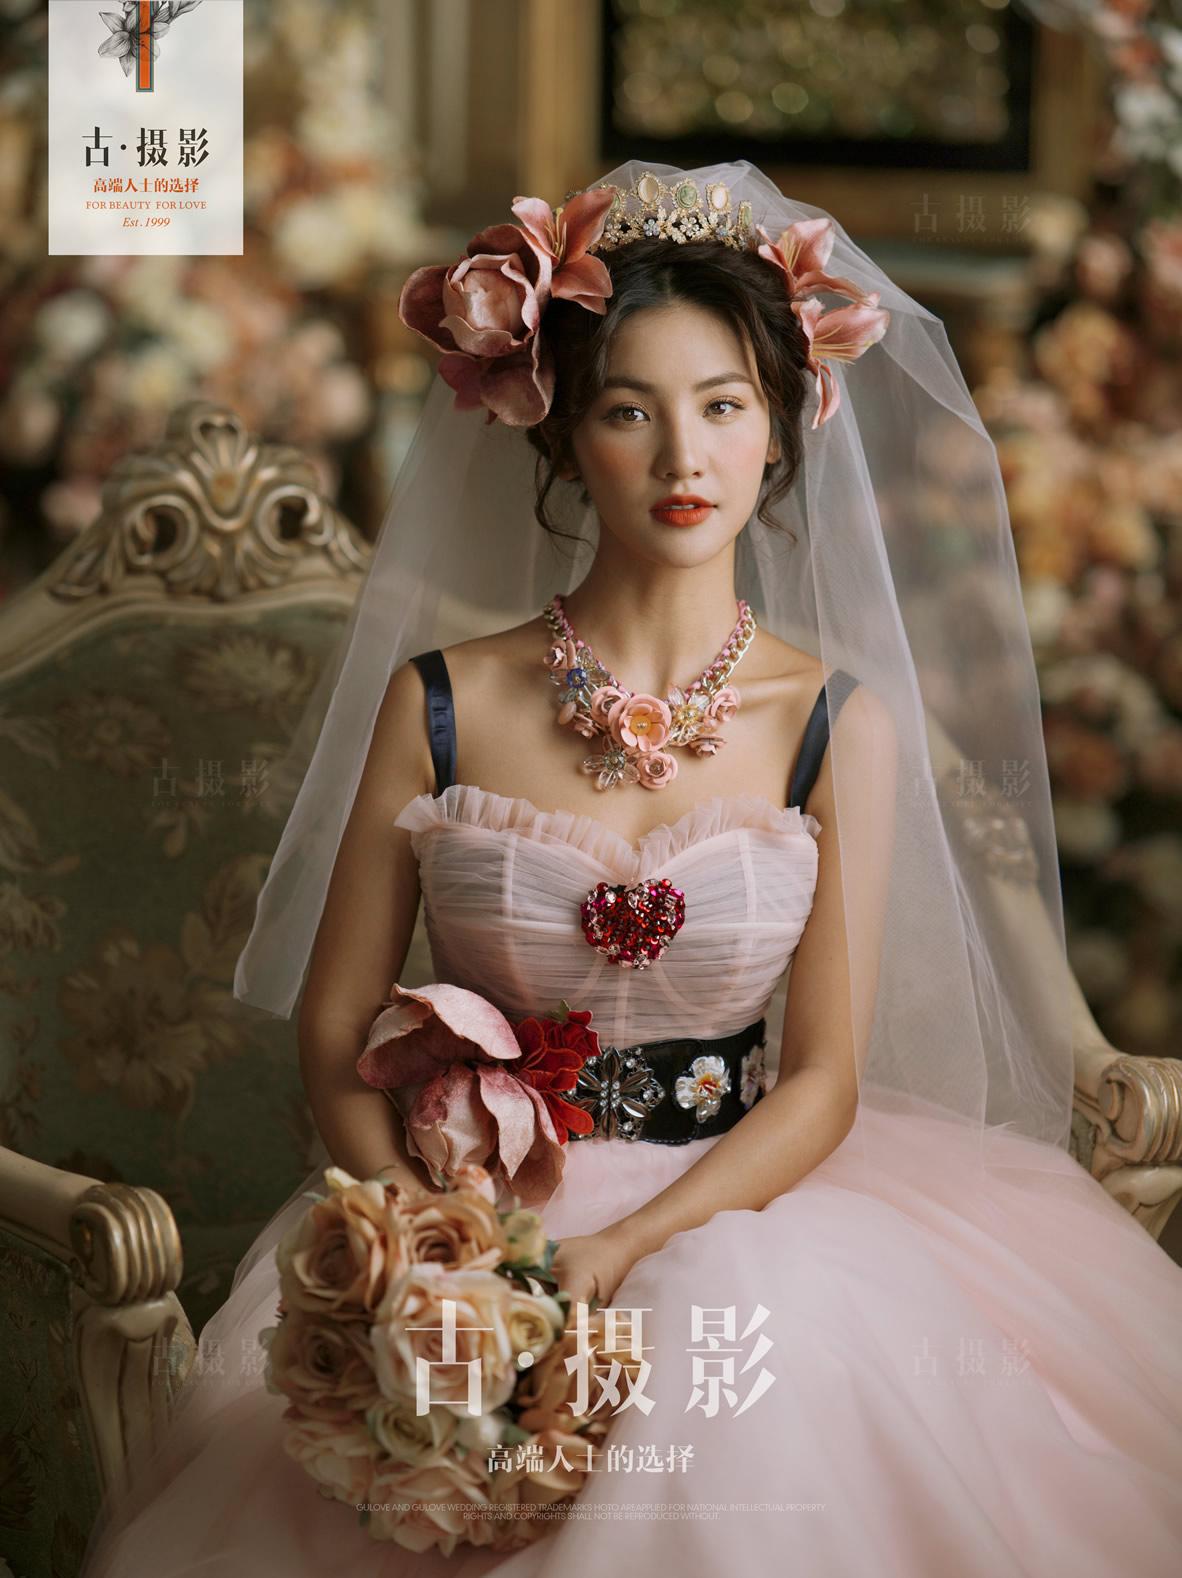 GRACE - 明星范 - 古摄影婚纱艺术-古摄影成都婚纱摄影艺术摄影网